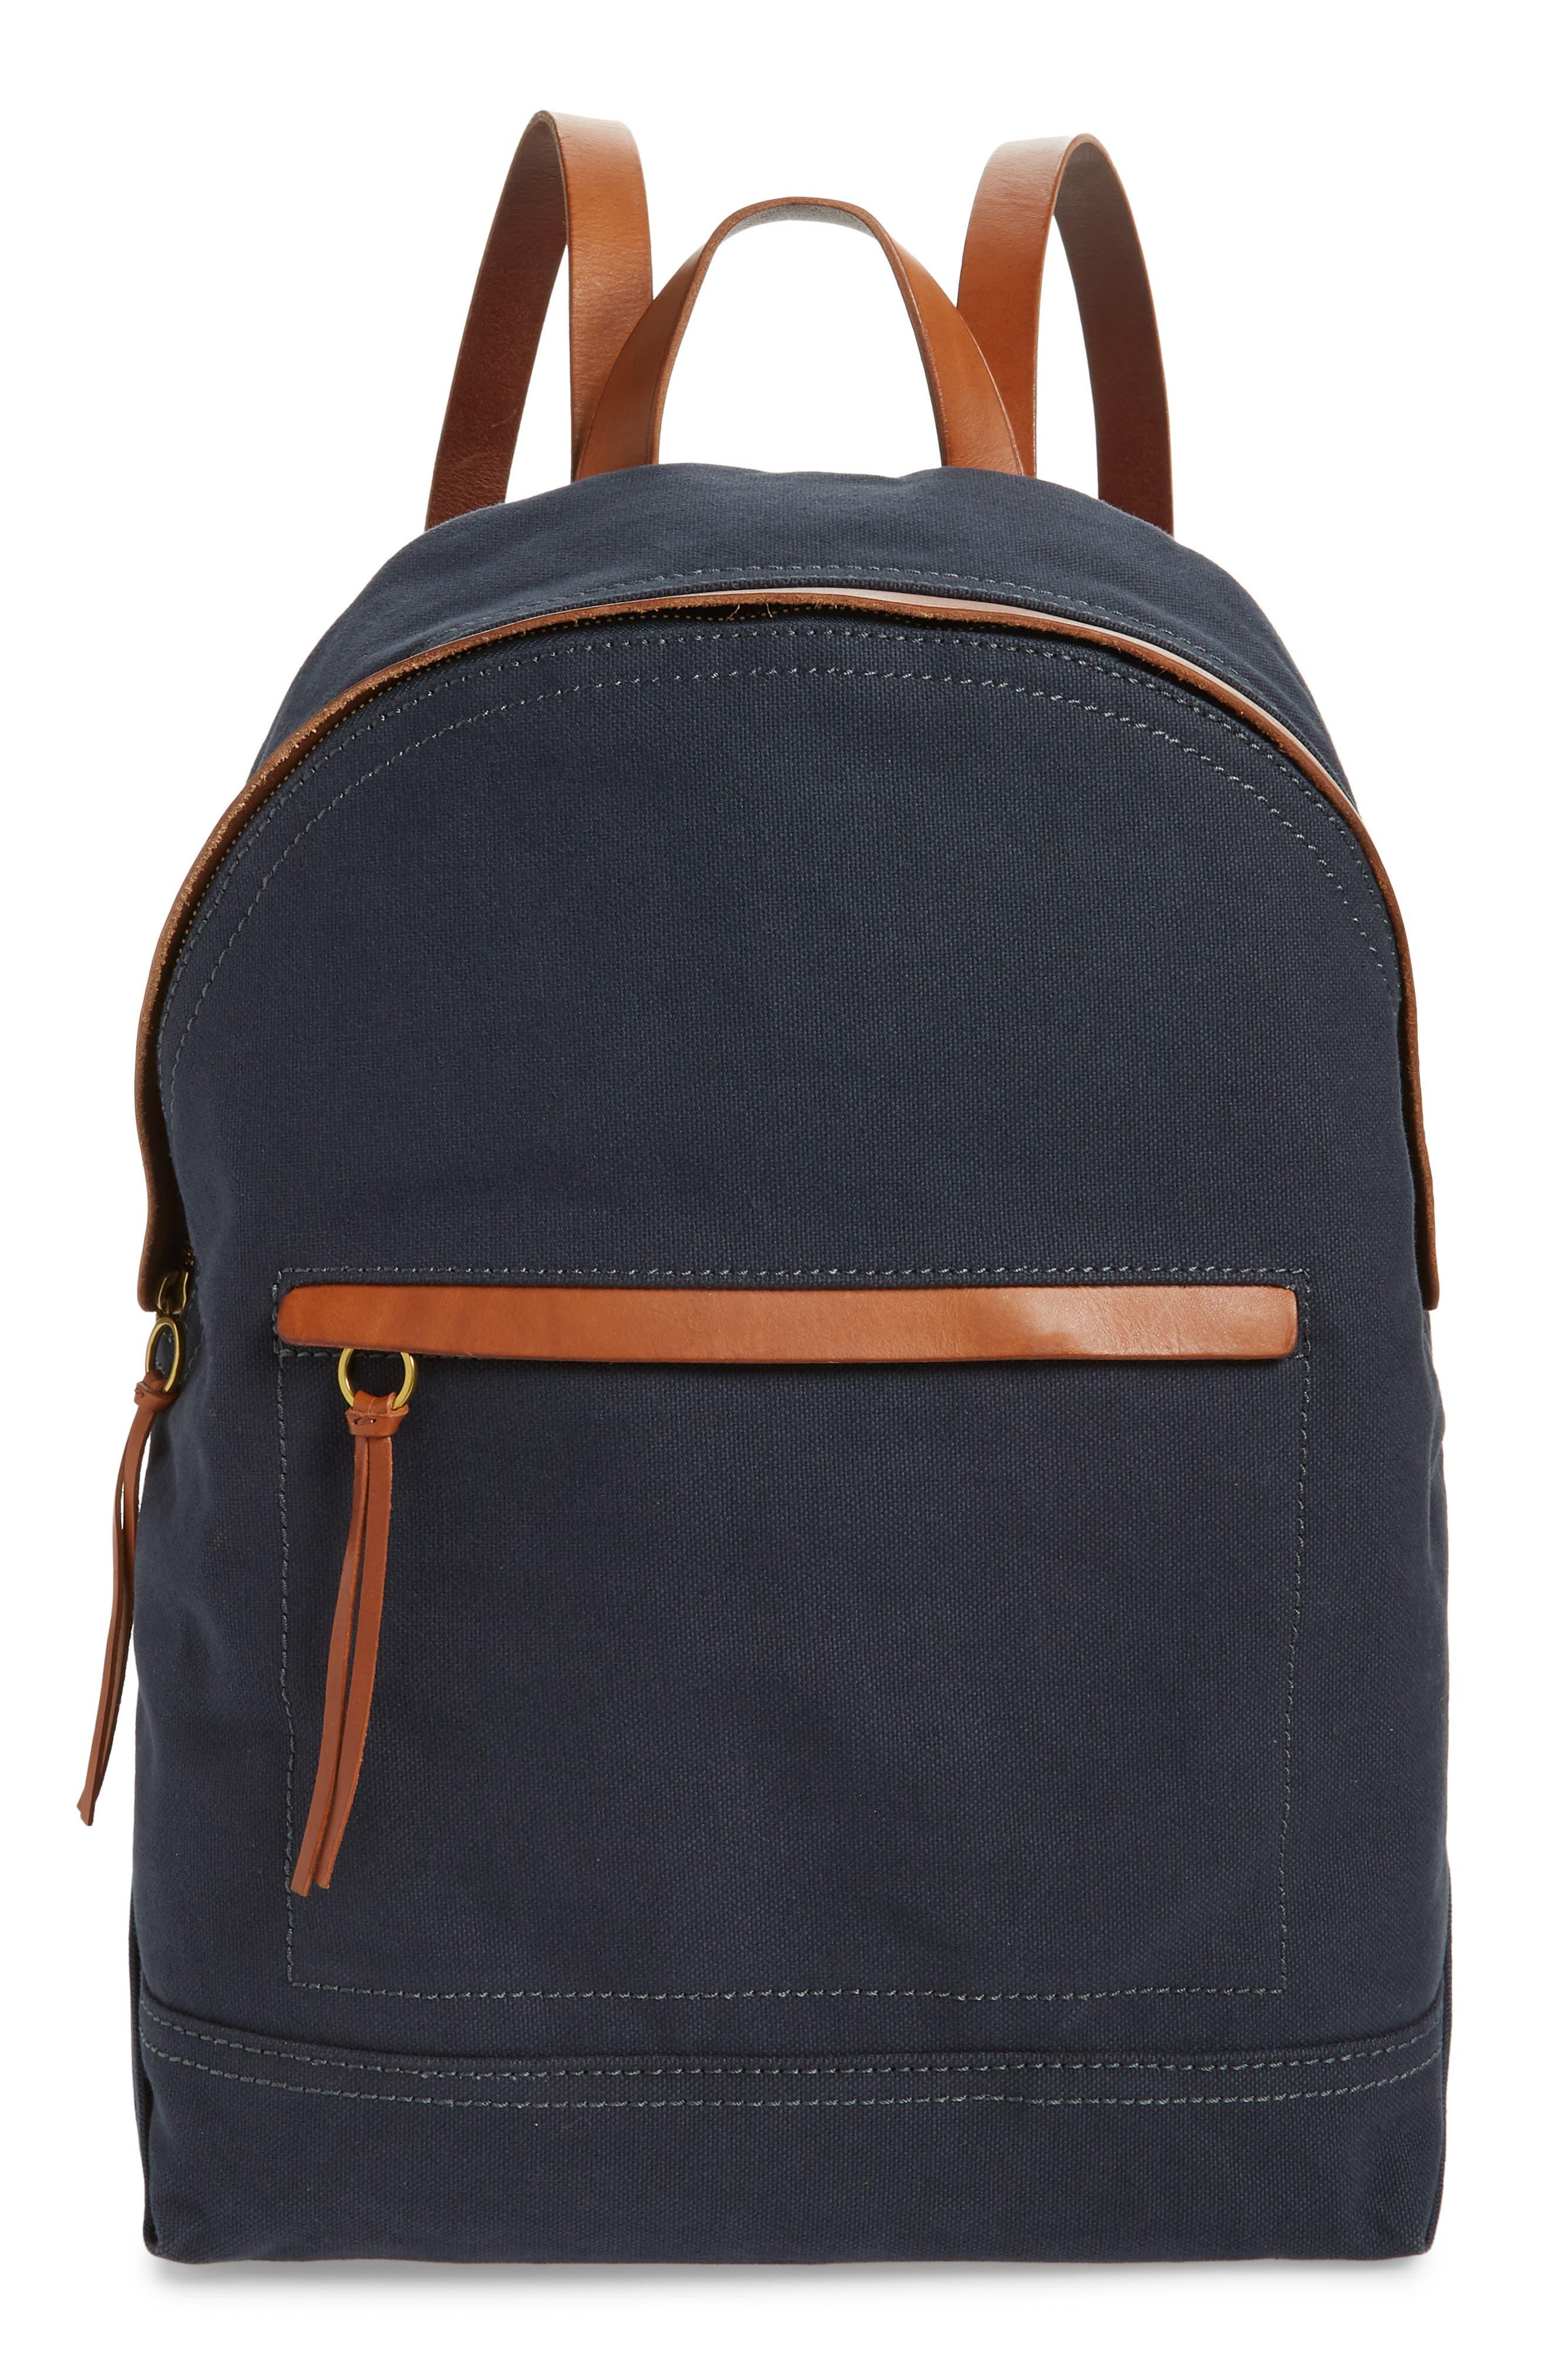 MADEWELL, The Charleston Backpack, Main thumbnail 1, color, BLACK SEA